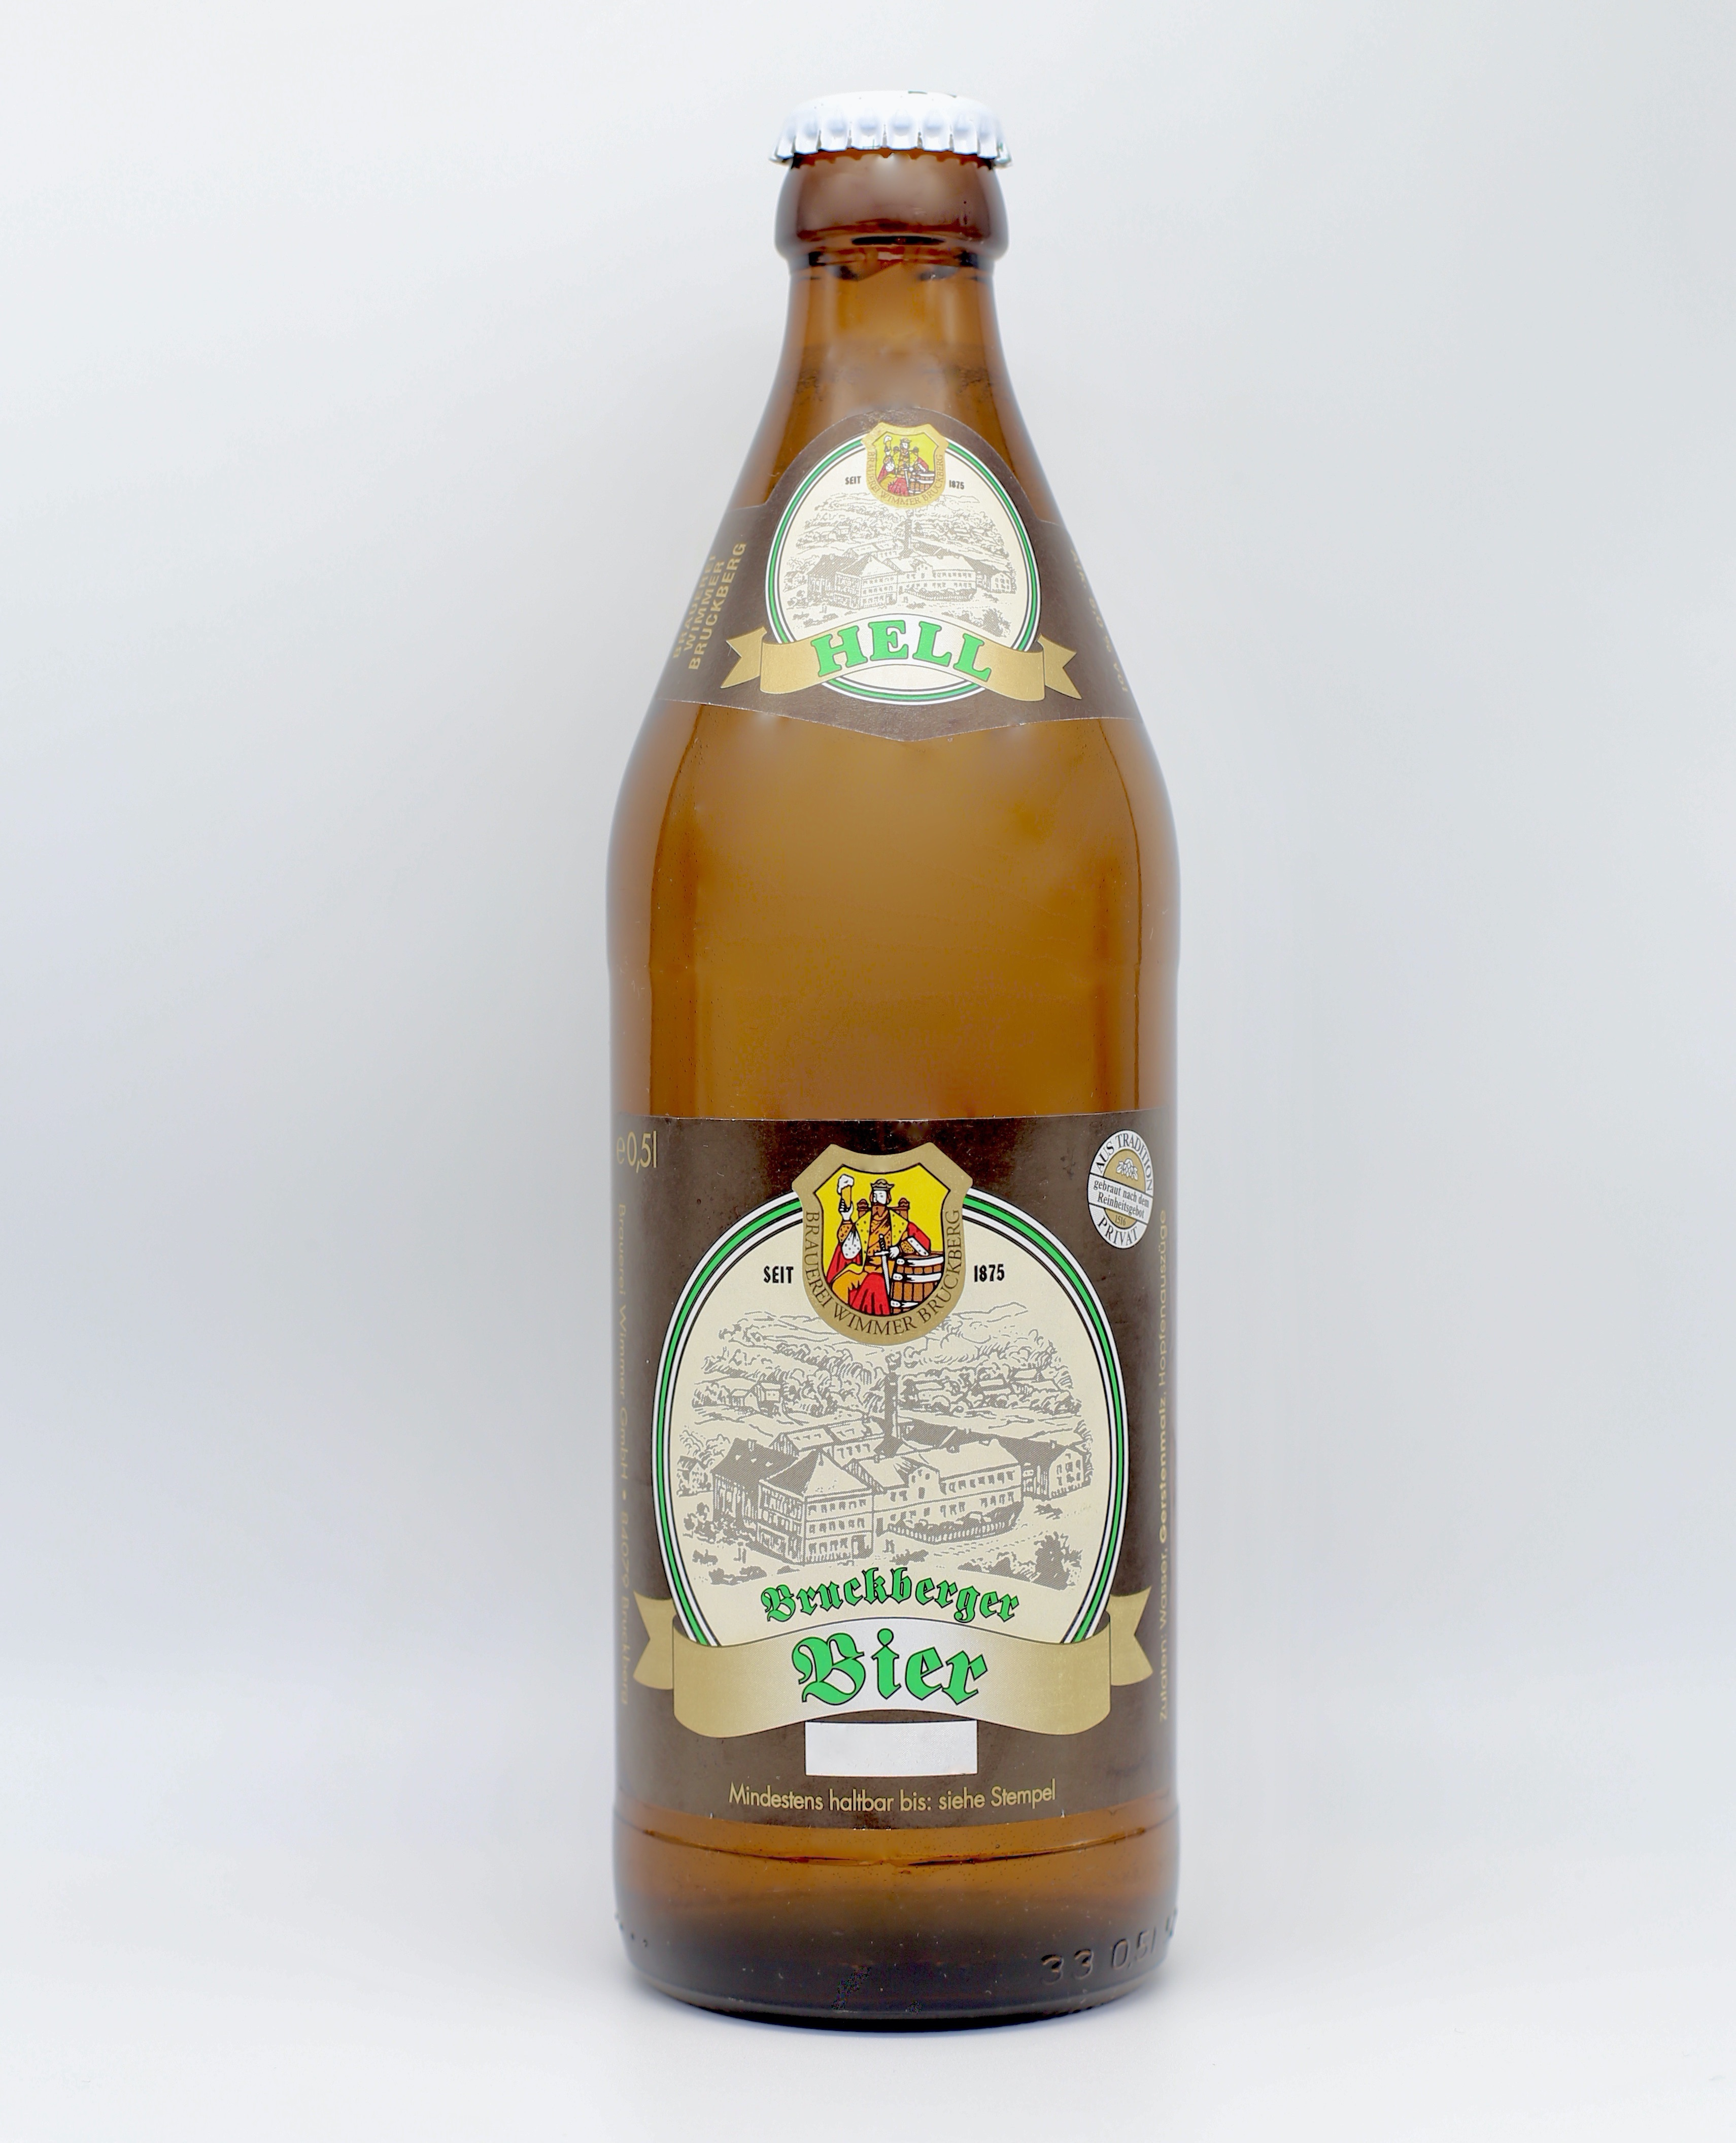 Bruckberger - HELL 0,5l